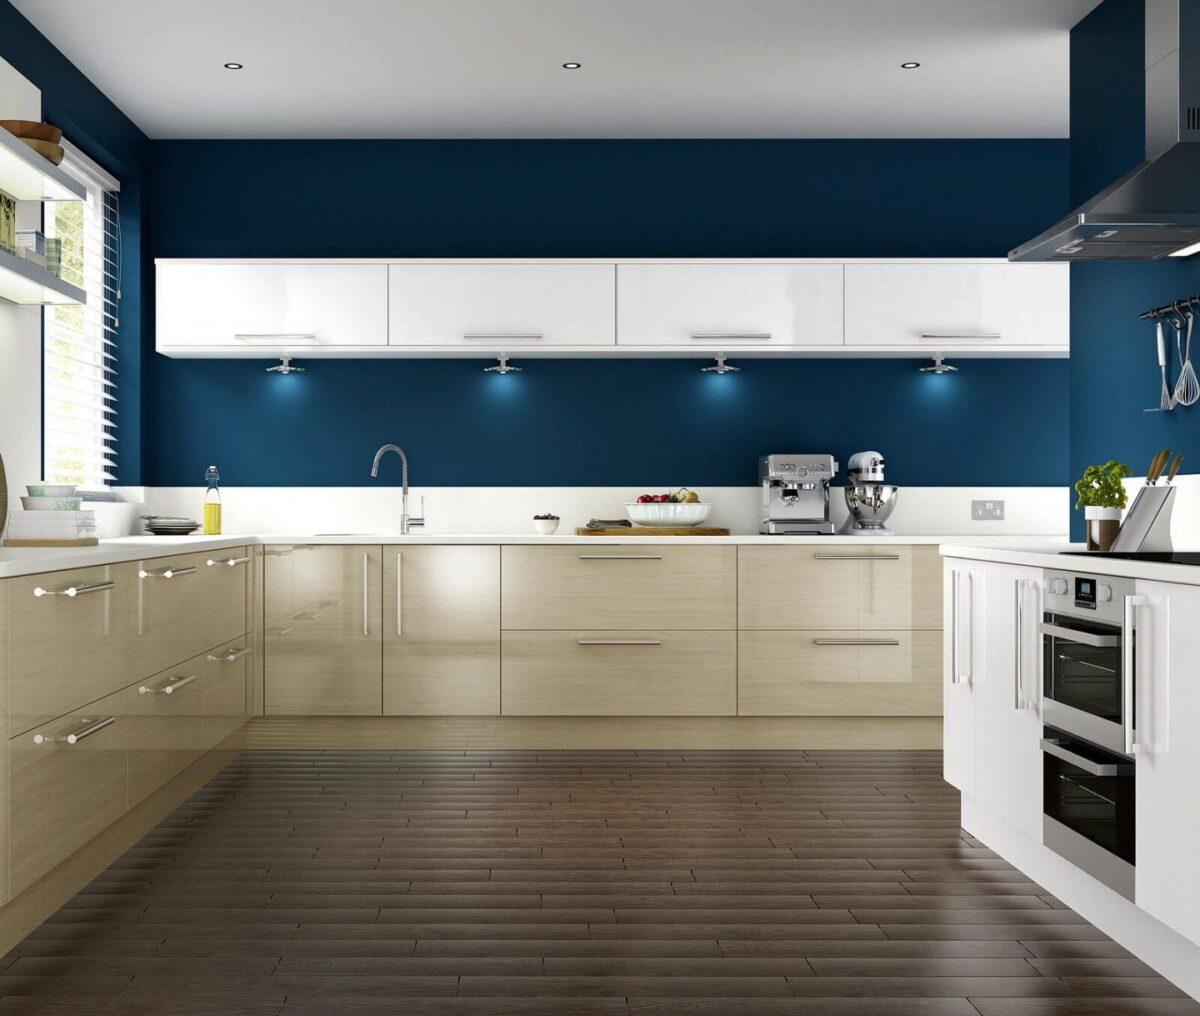 cucina-pareti-color-blu-navy-1